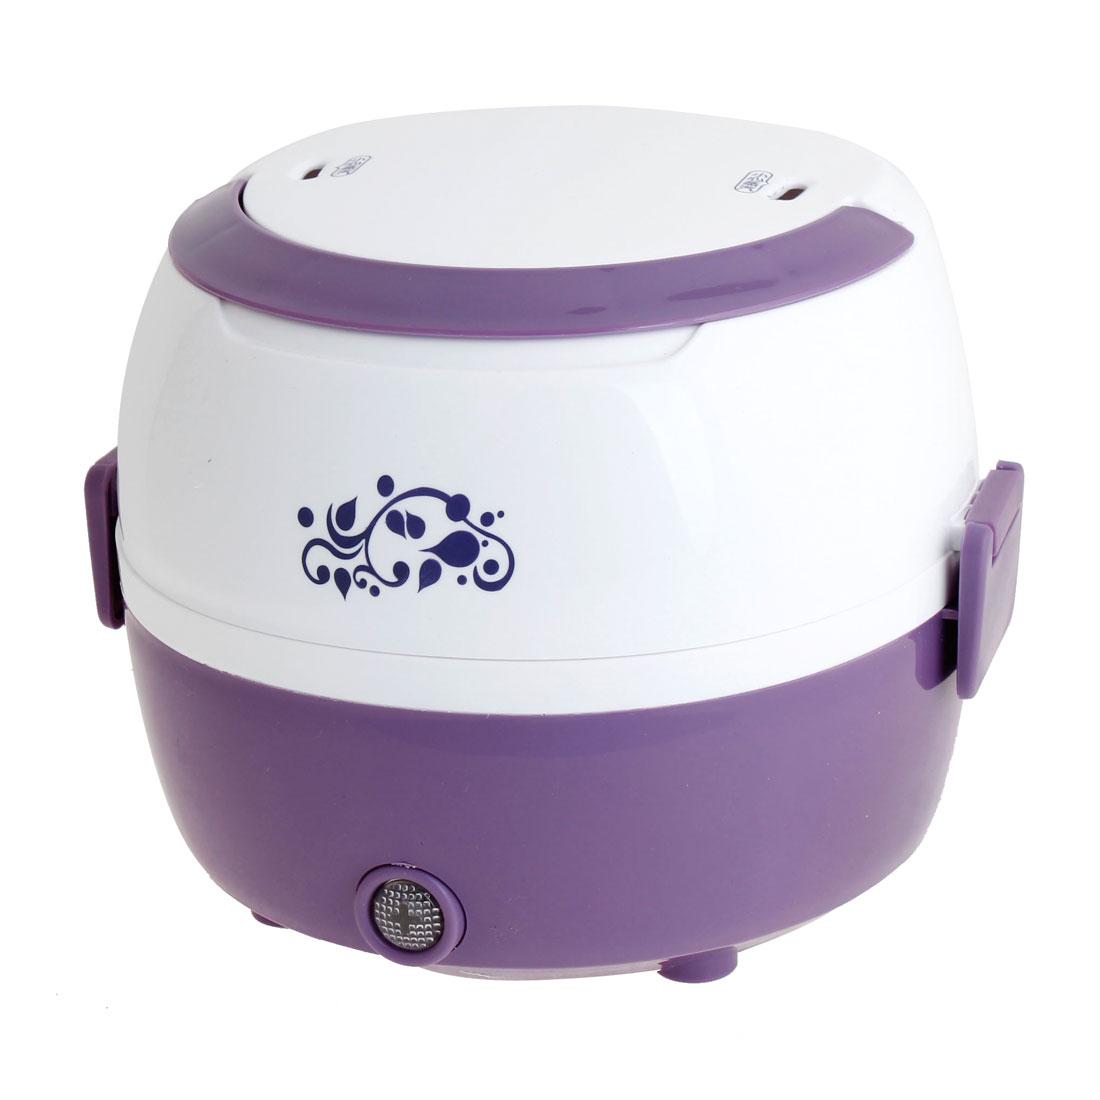 AU 3 Pin Plug AC 220V Rice Boiler Egg Steamer Electric Cooker Purple White